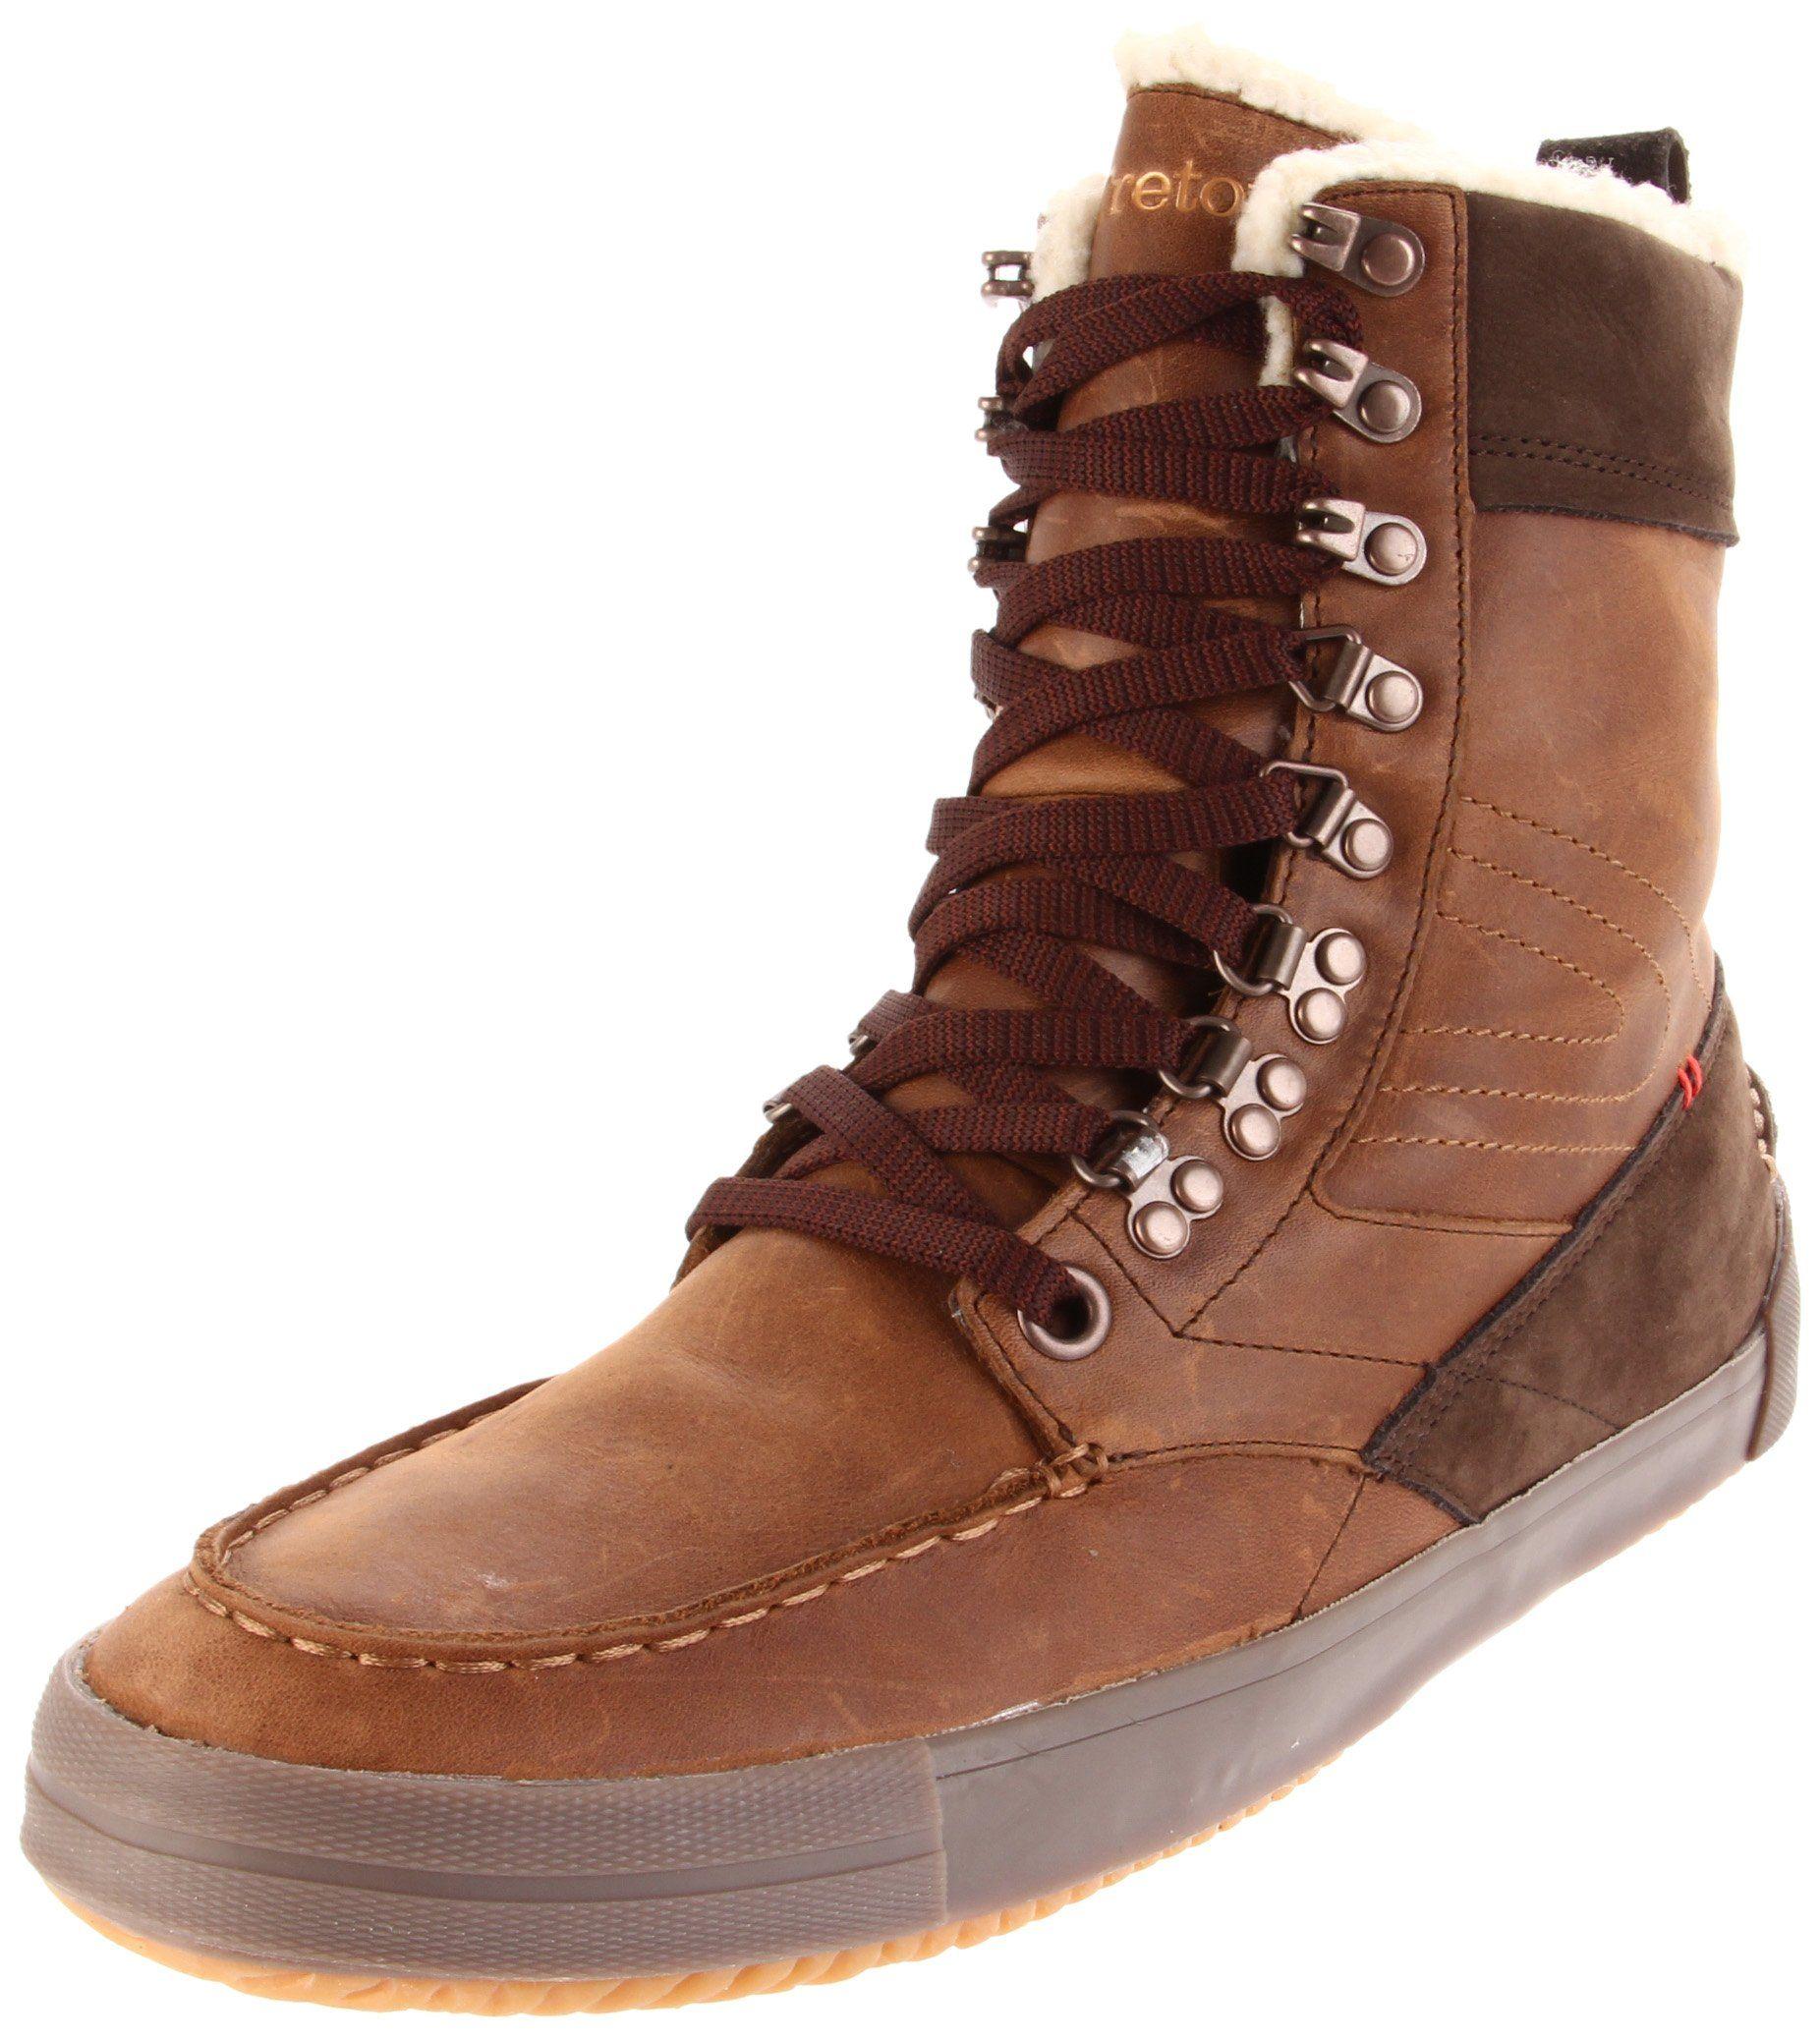 e88b4abd6be Amazon.com: Tretorn Highlander Vinter Hiking Boot, Black, Men's US 4 ...